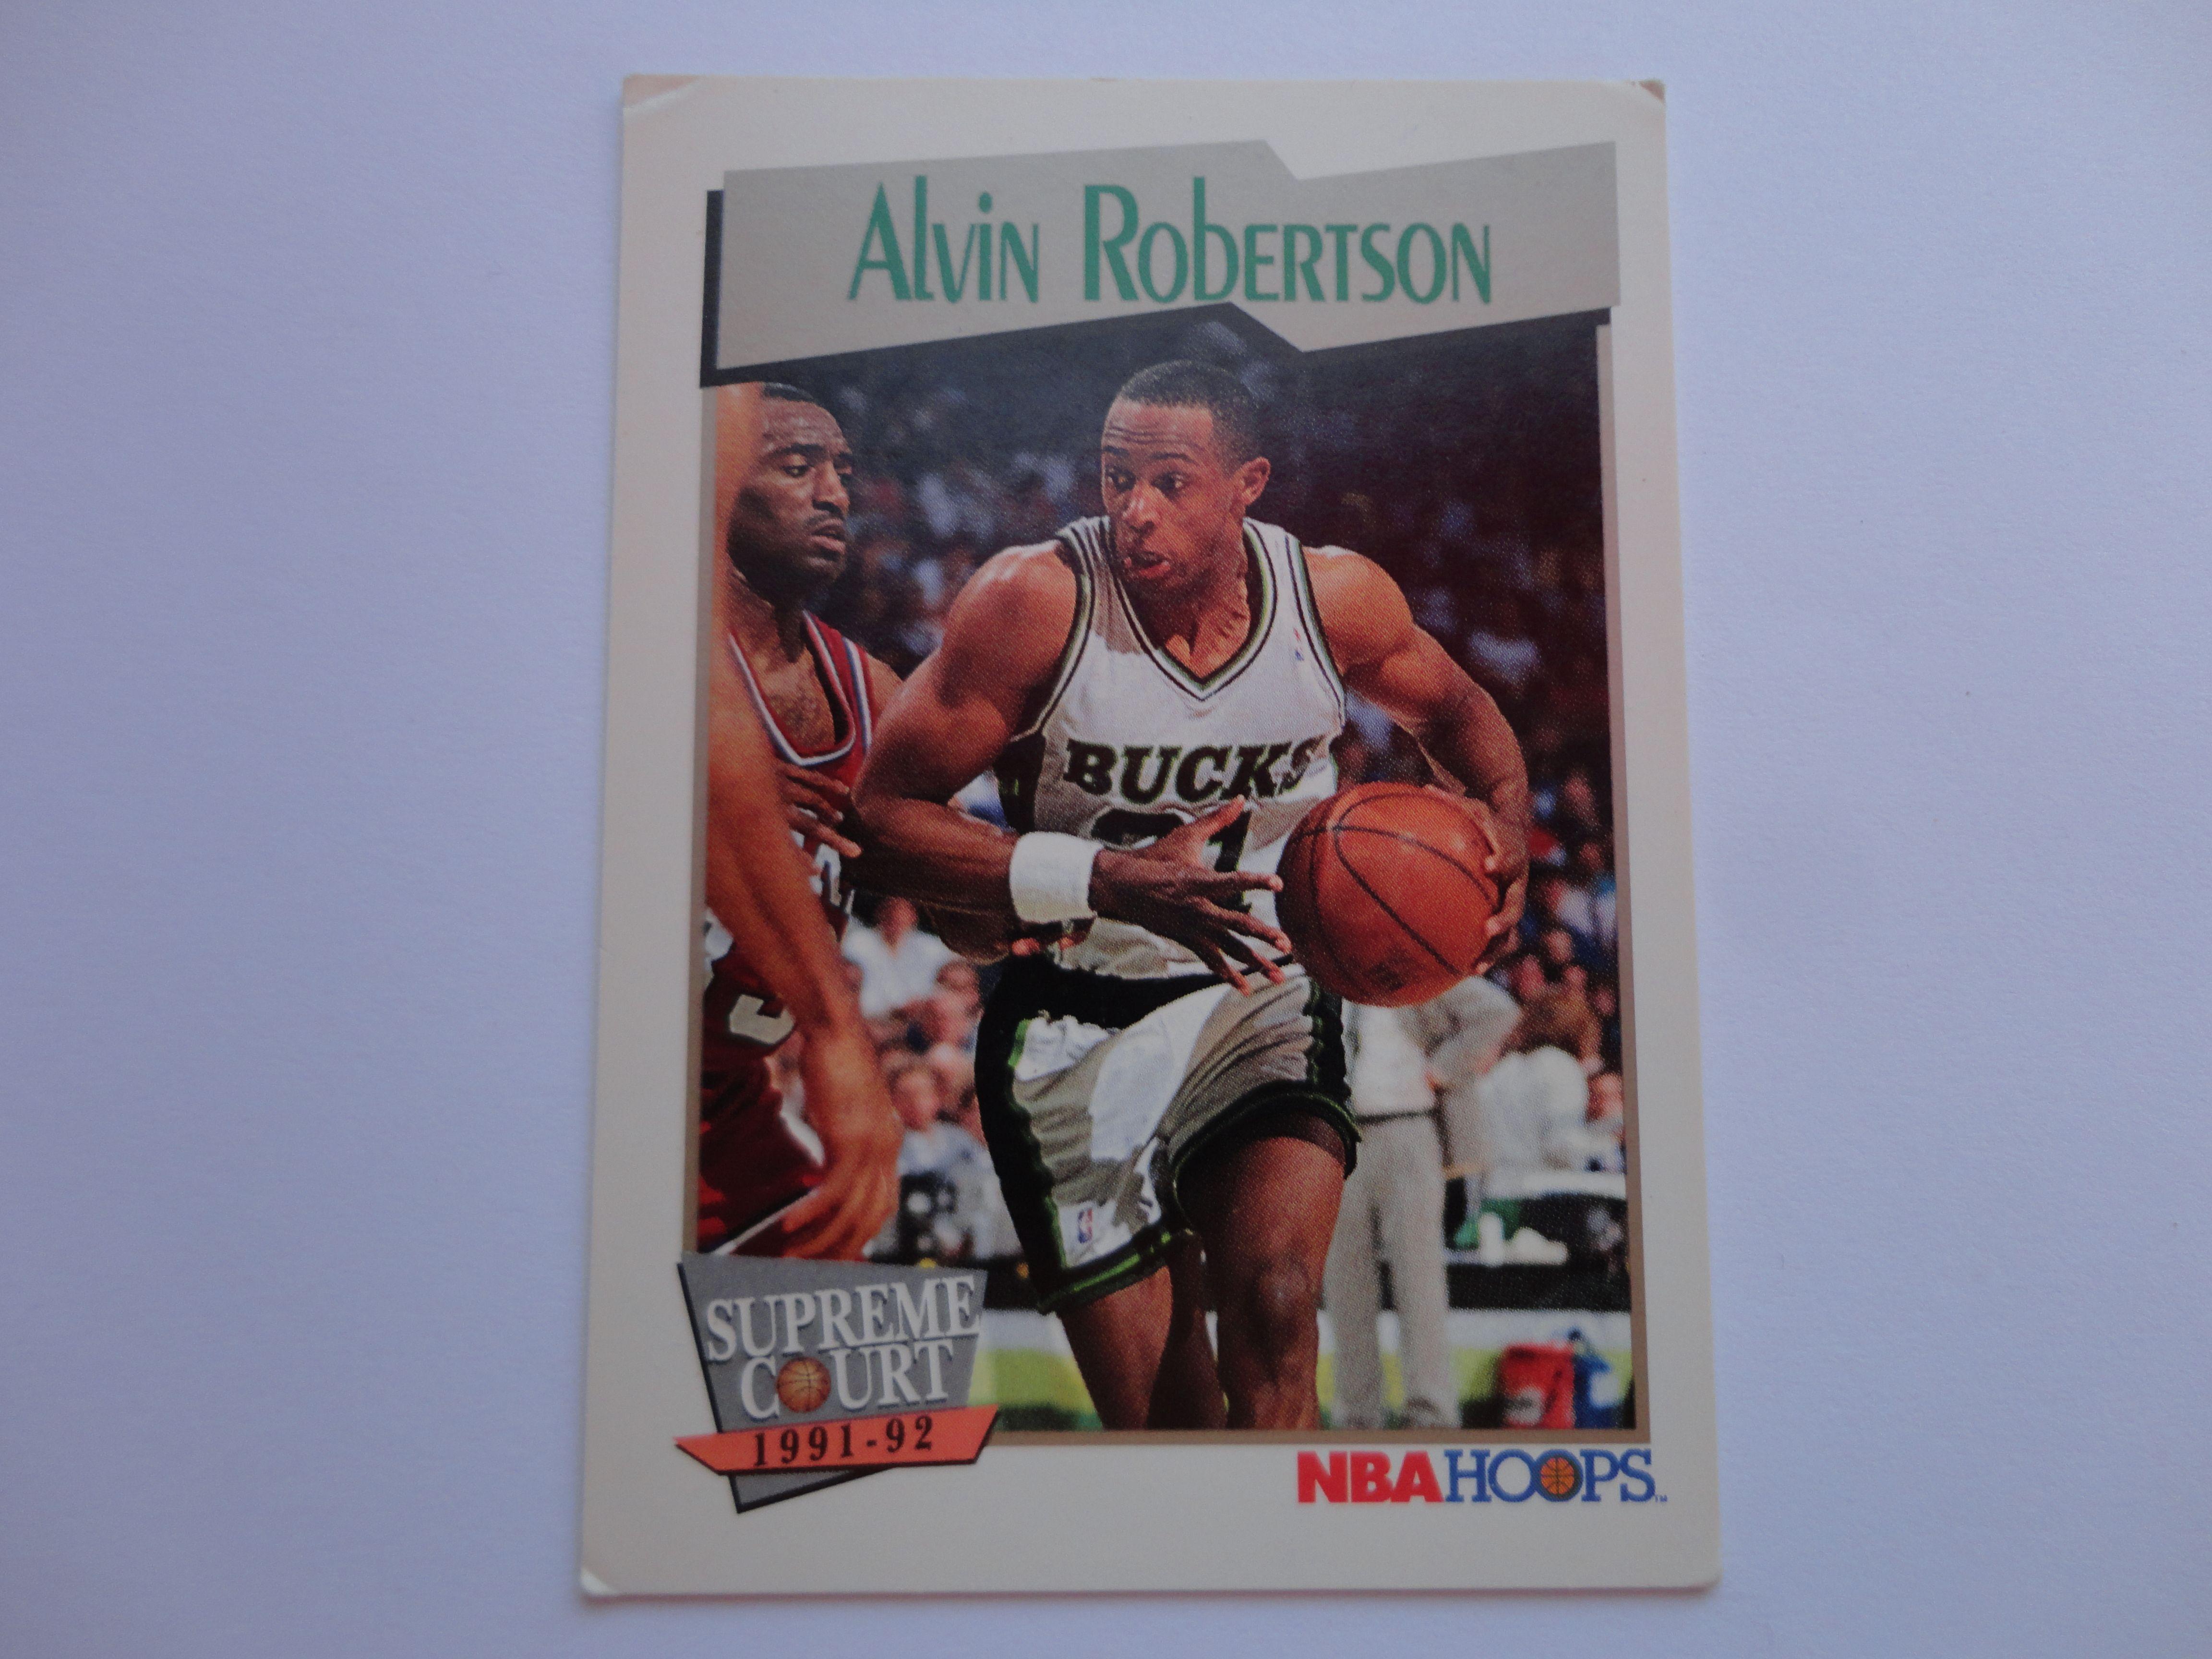 Alvin Robertson NBA Hoops Supreme Court 1991 92 Basketball